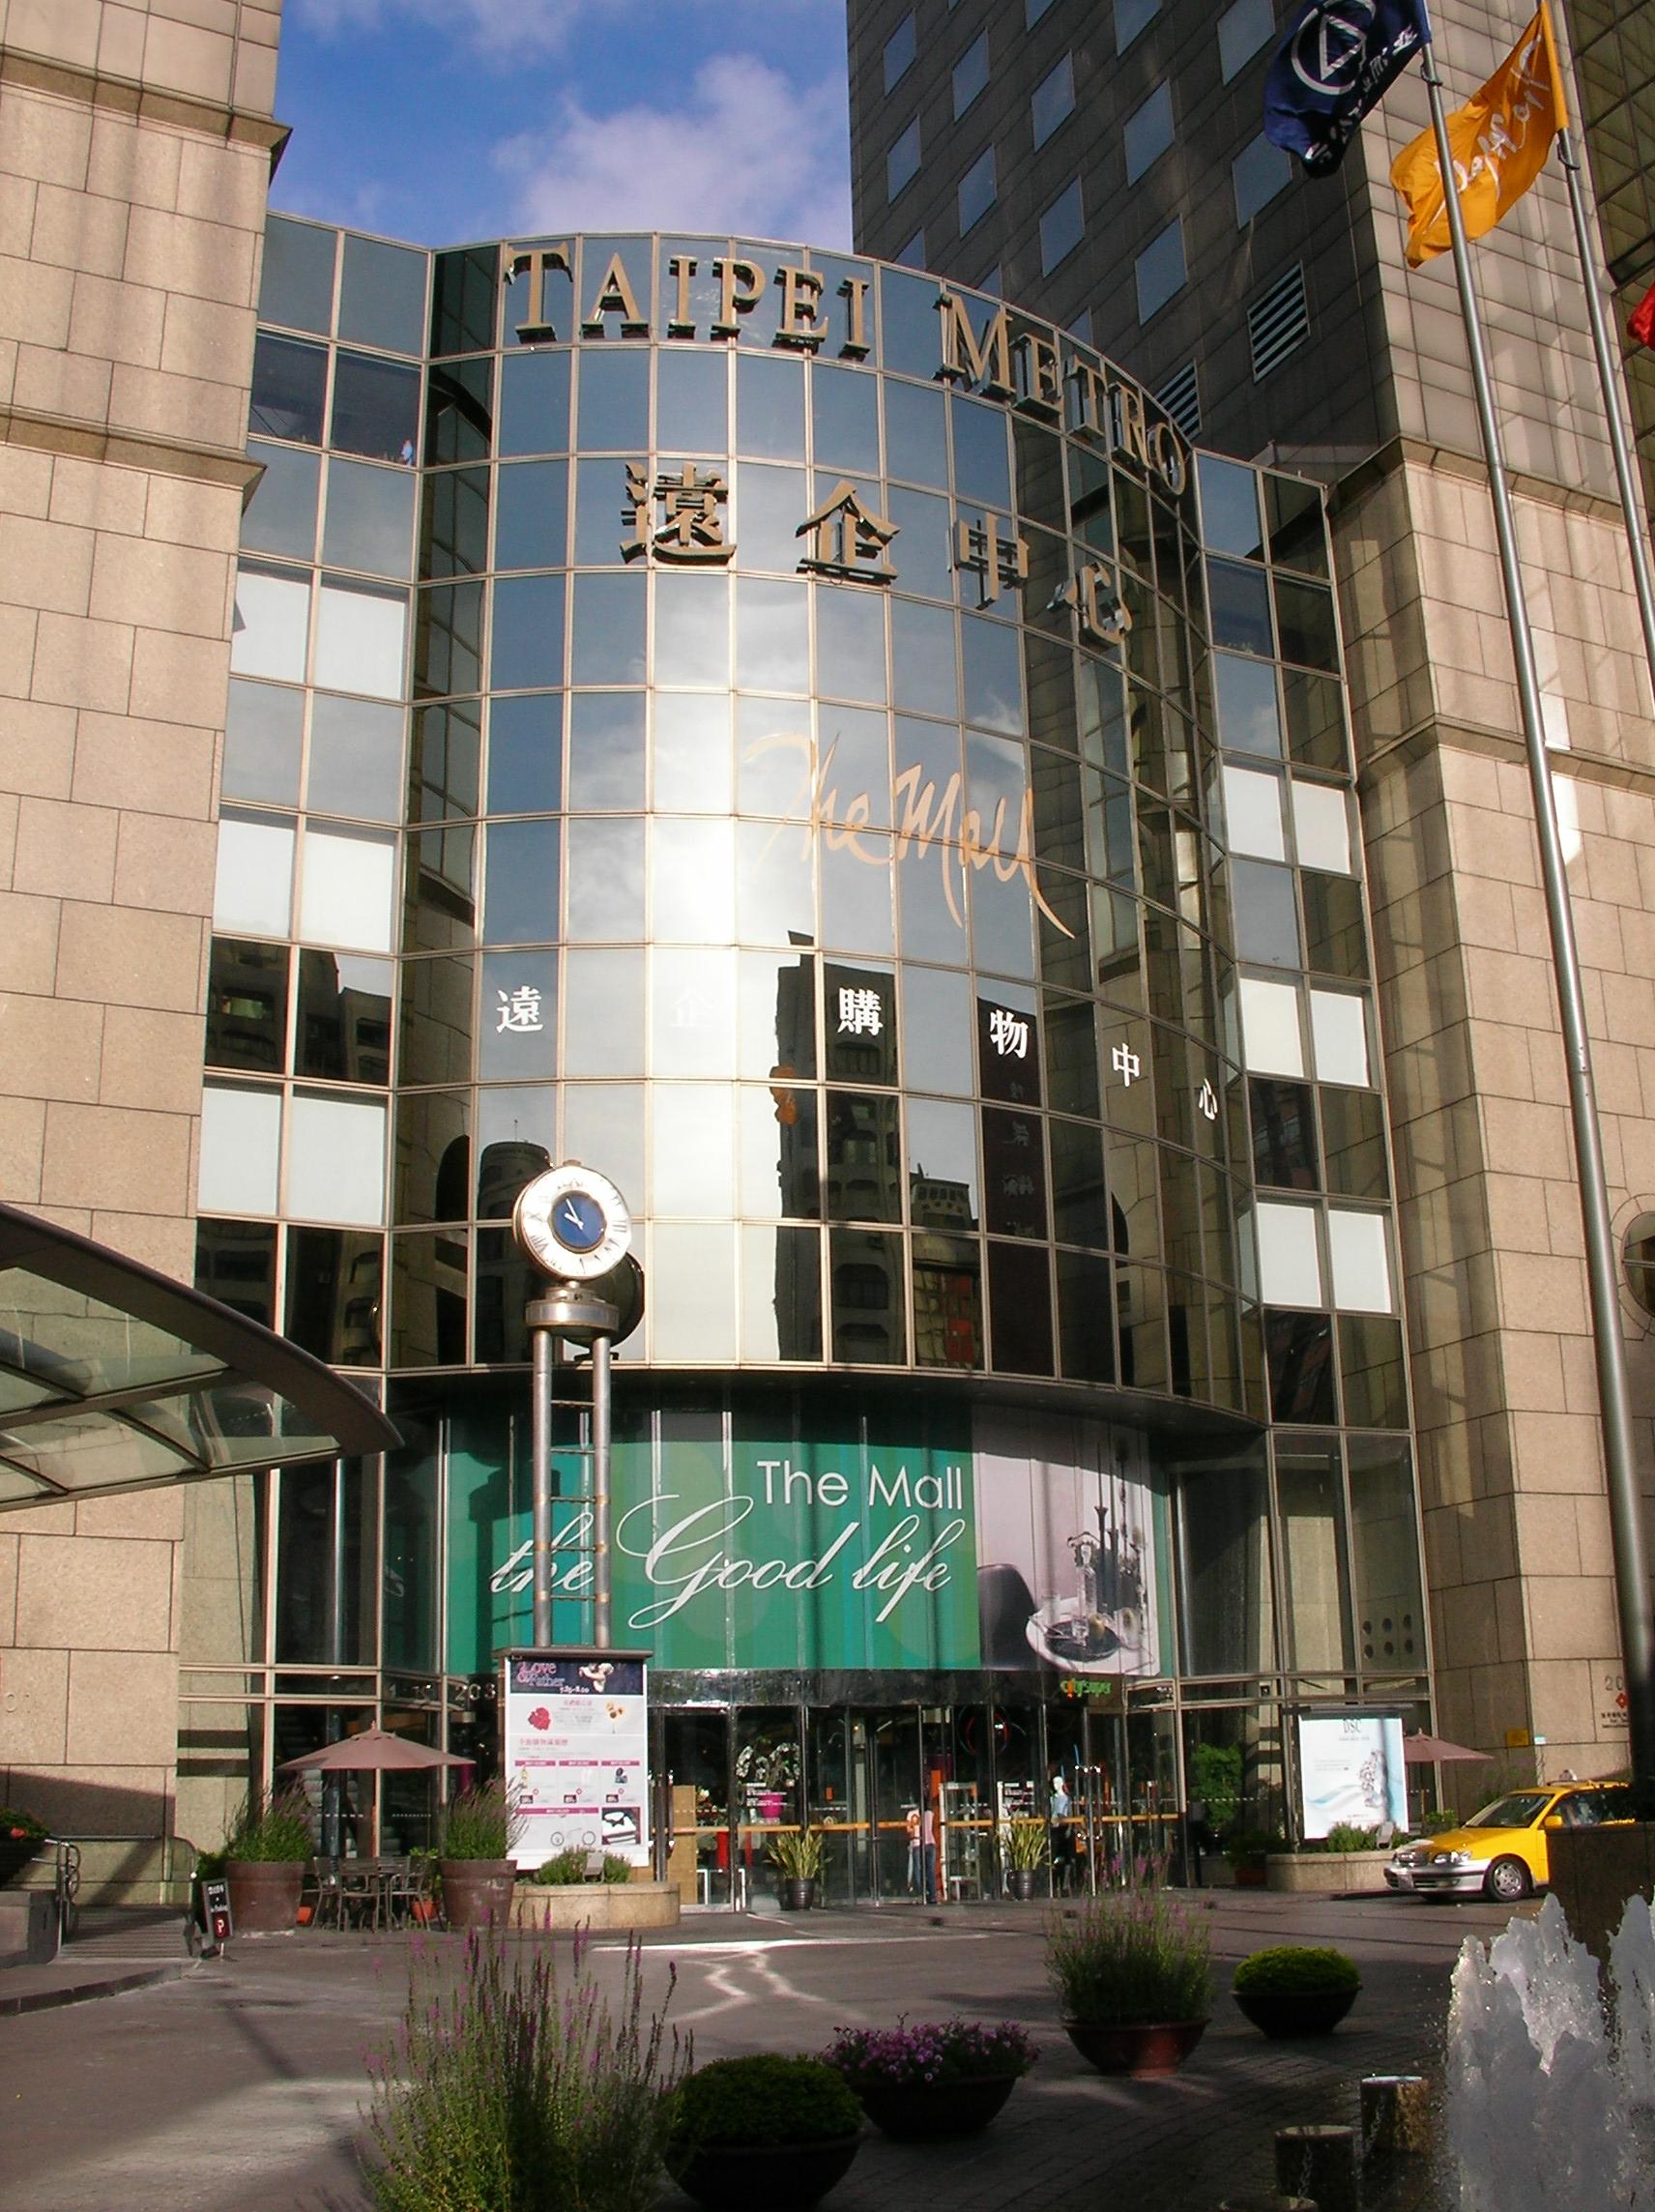 File:Far Eastern Plaza The Mall.jpg - Wikimedia Commons